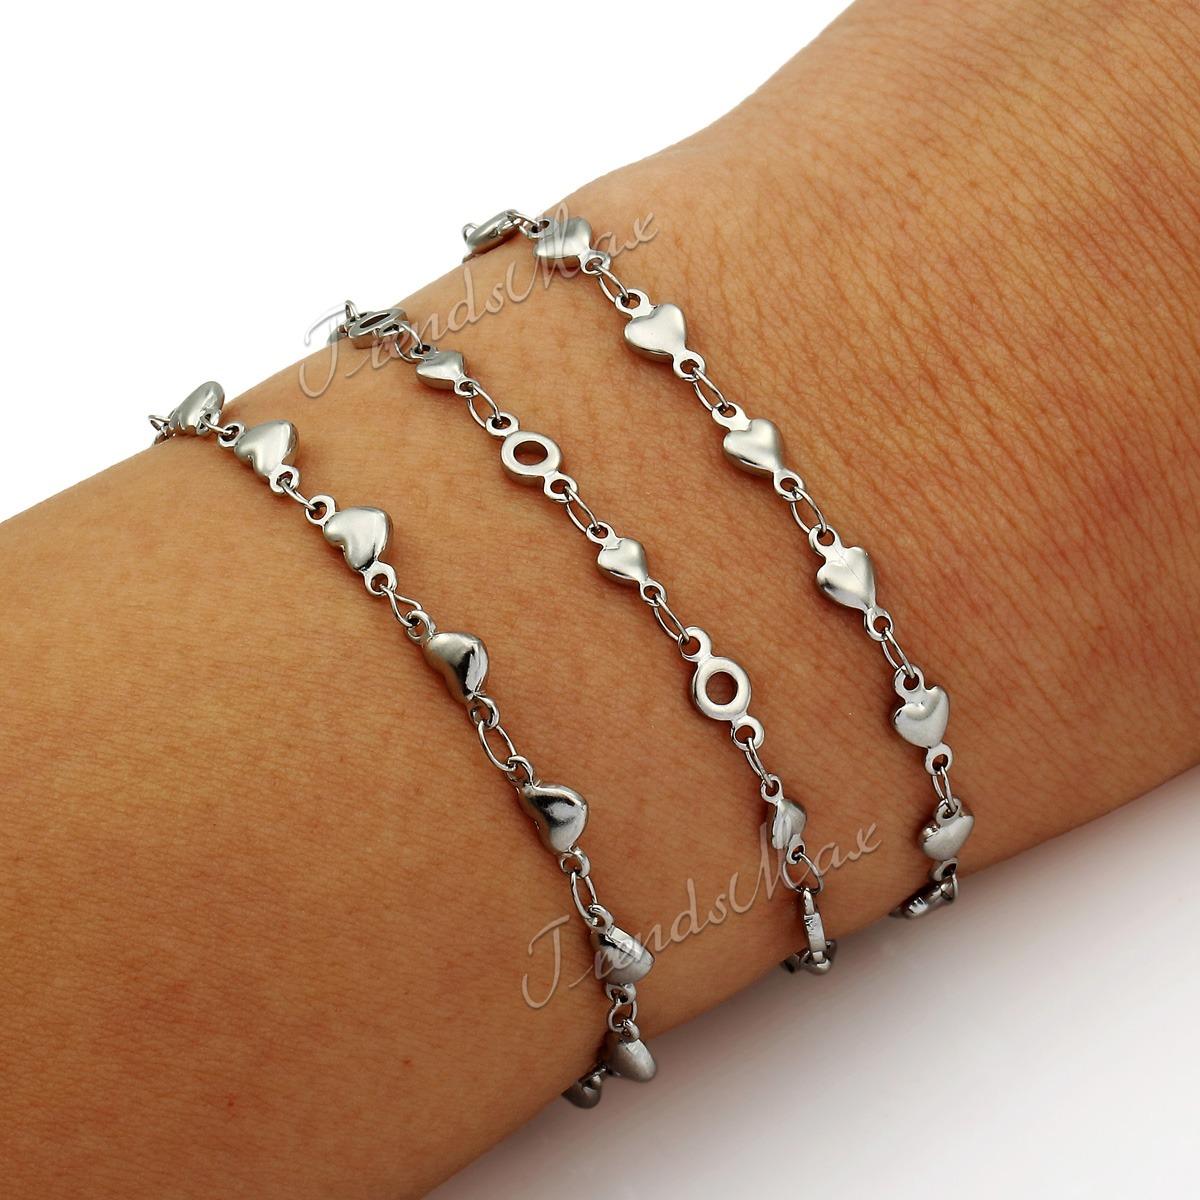 Chain Bracelet Womens: Womens Ladies Girls Chain Stainless Steel Heart Link